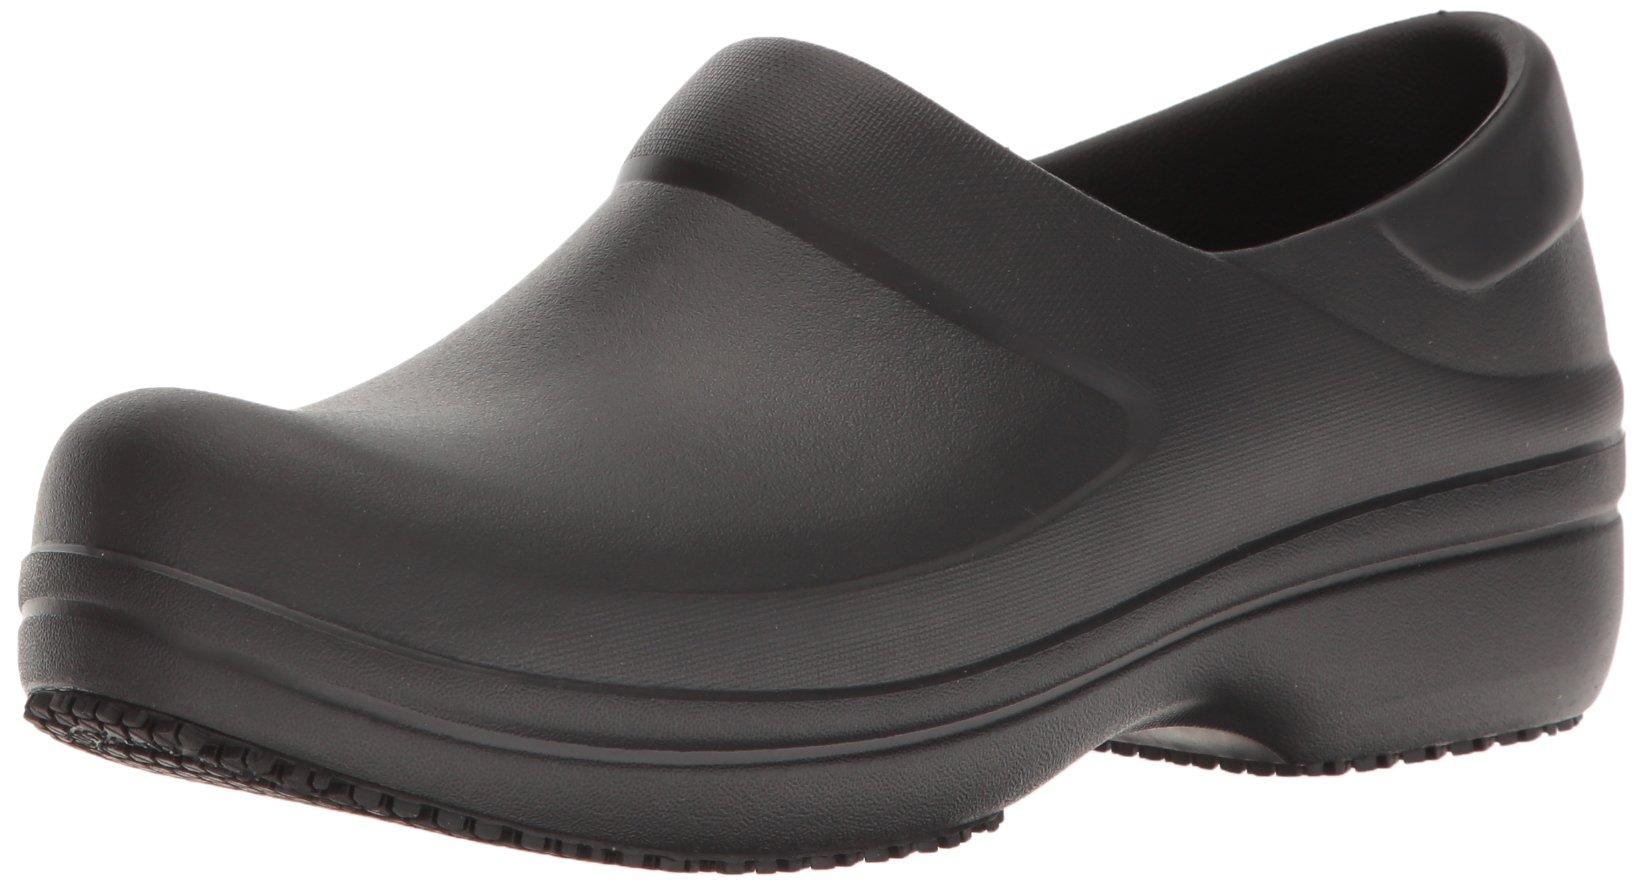 Crocs Women's Neria Pro Clog W Mule, Black, 9 M US